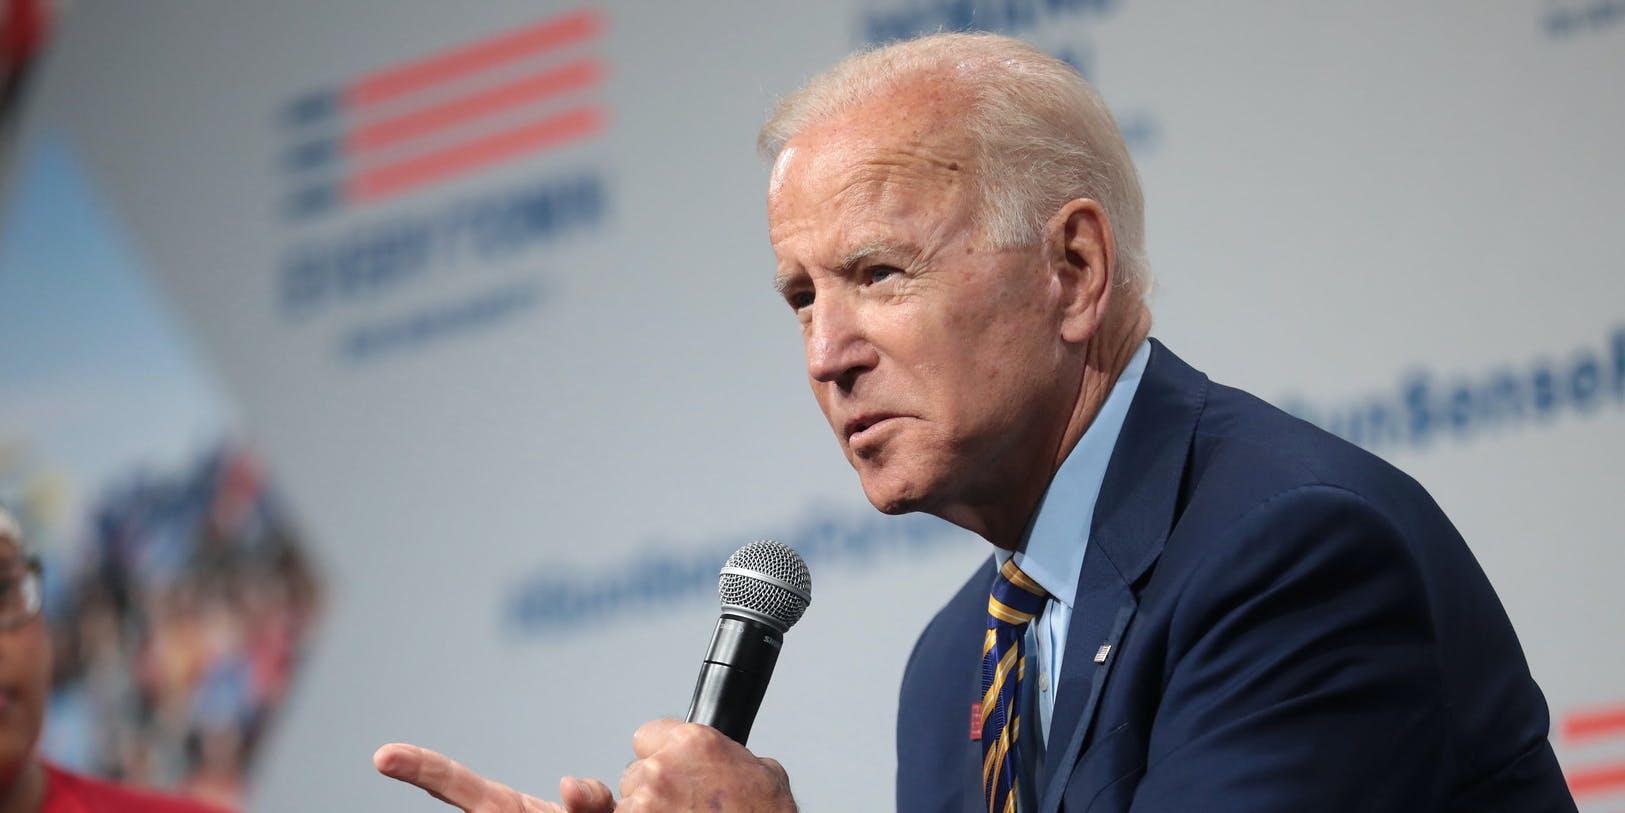 Joe Biden Views On Section 230 Communications Decency Act